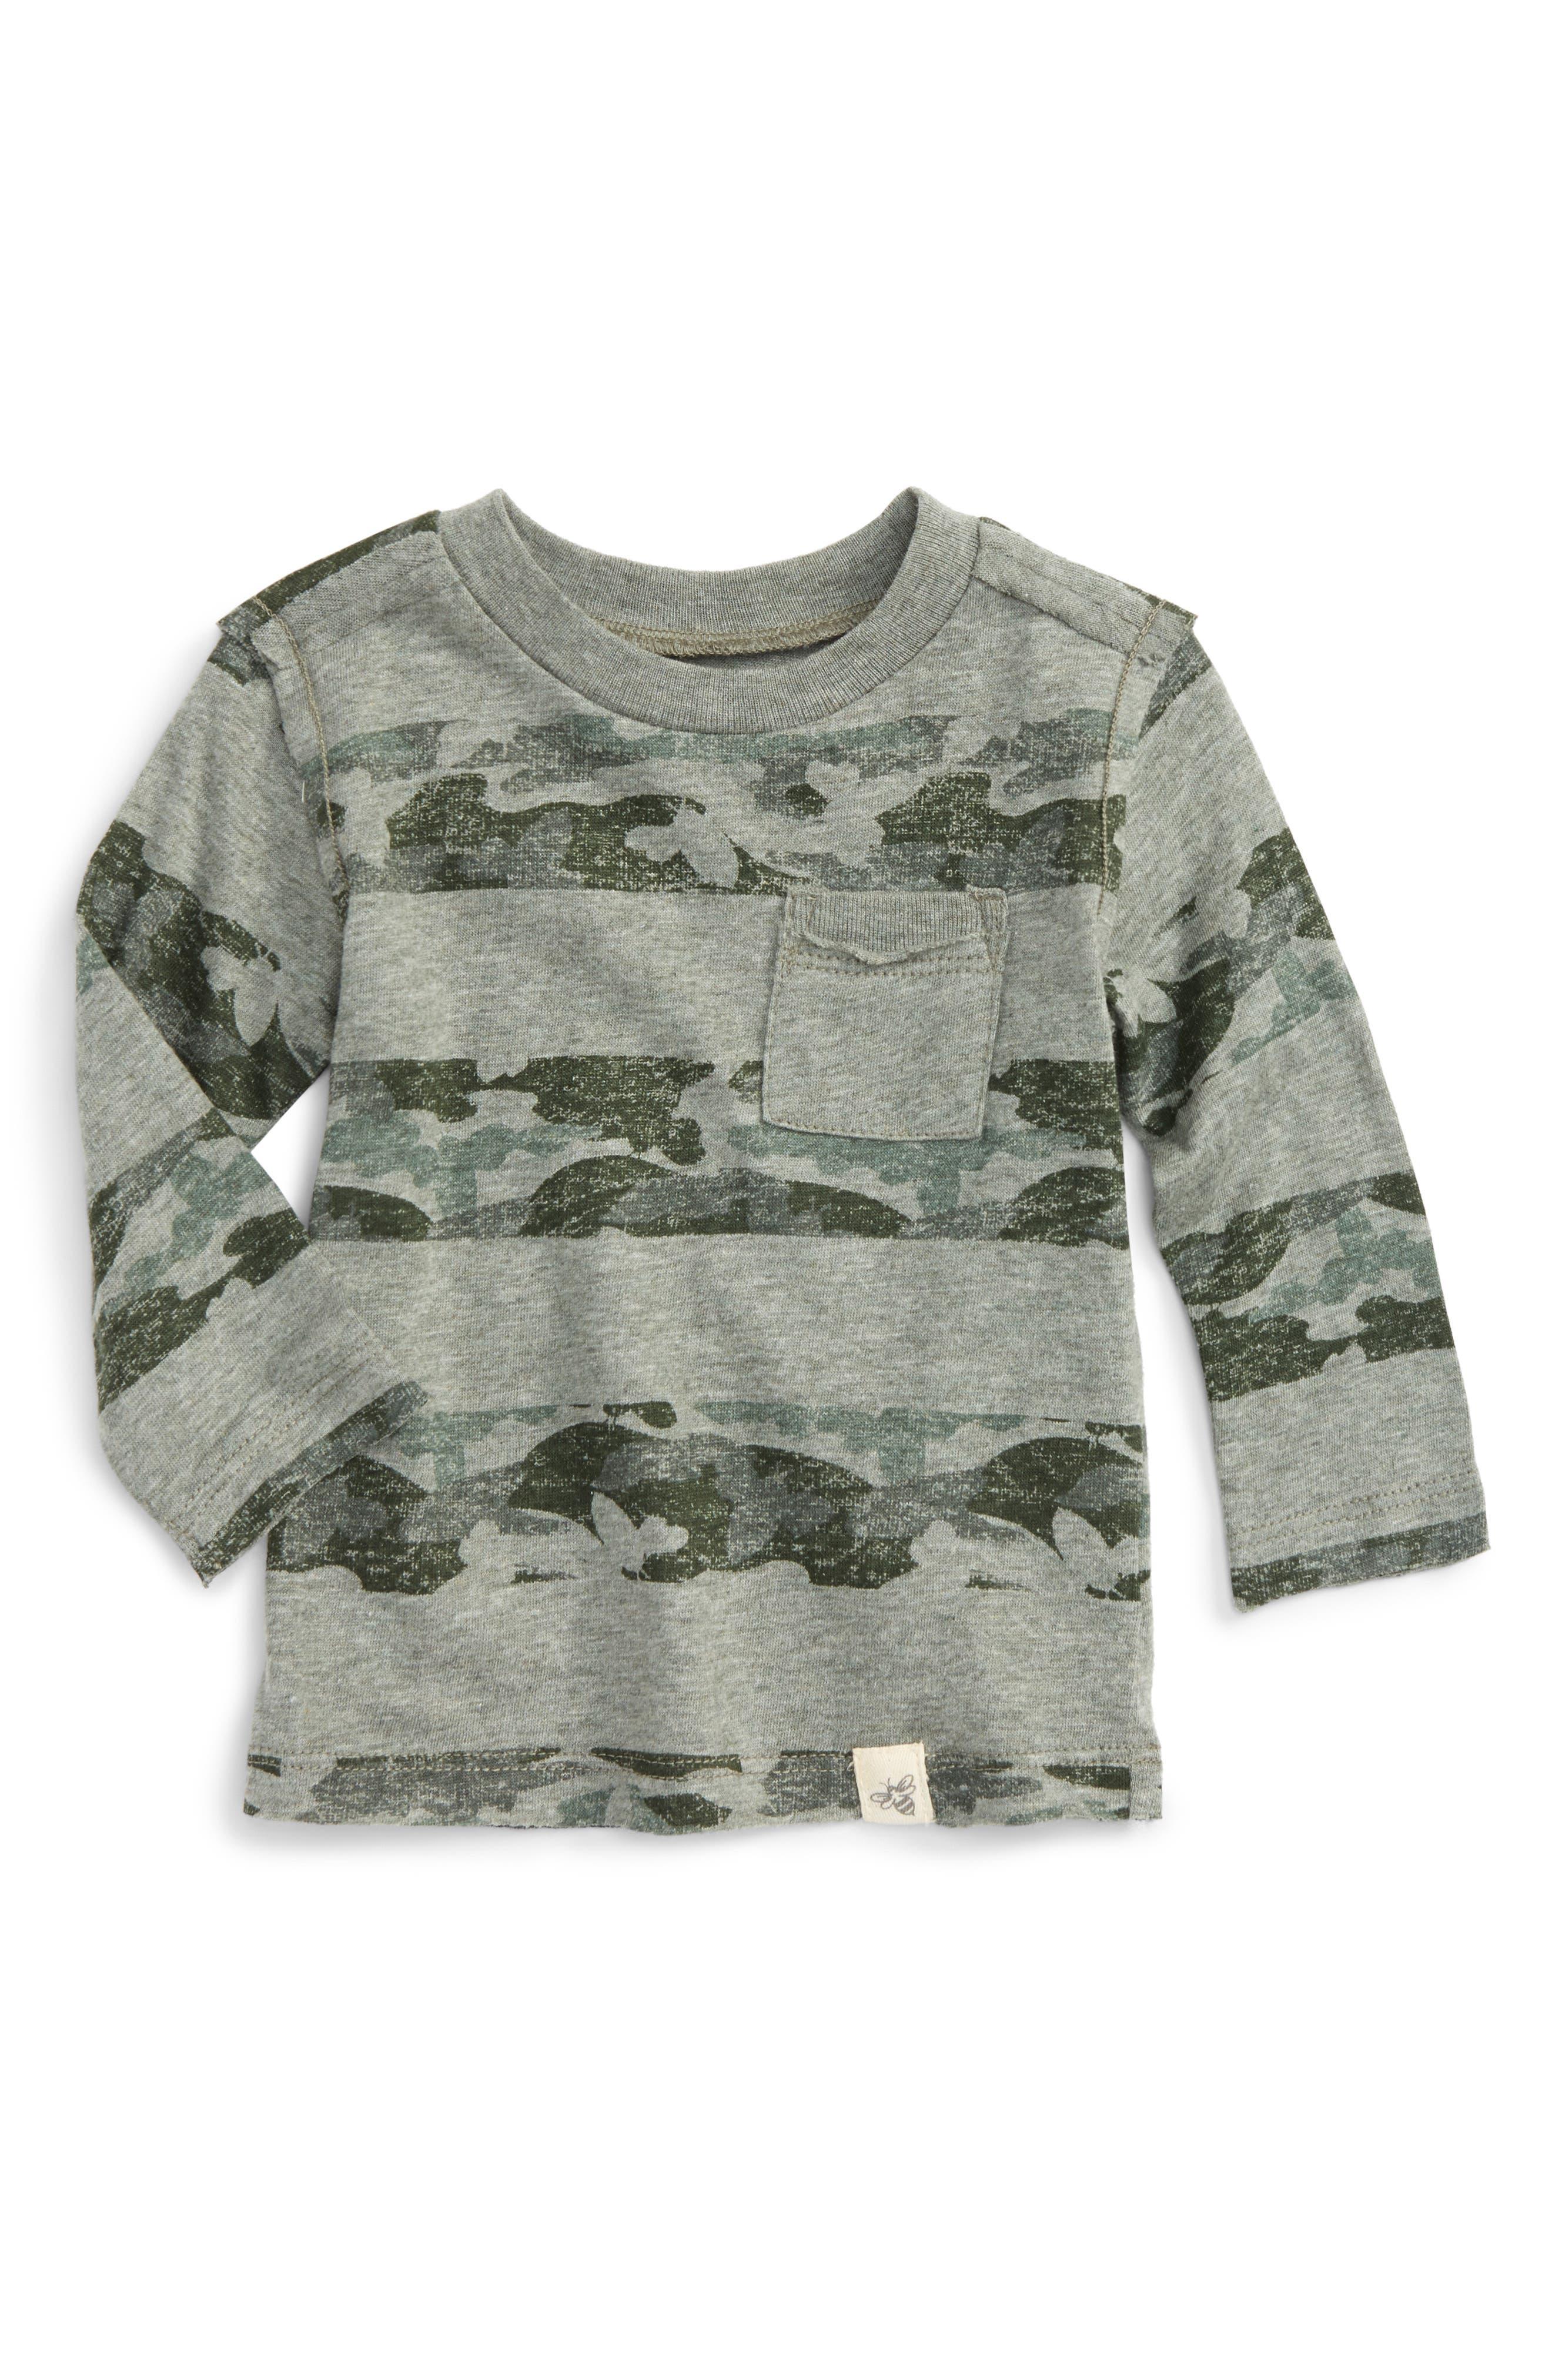 Alternate Image 1 Selected - Burt's Bees Baby Camo Print Organic Cotton Pocket T-Shirt (Baby Boys)